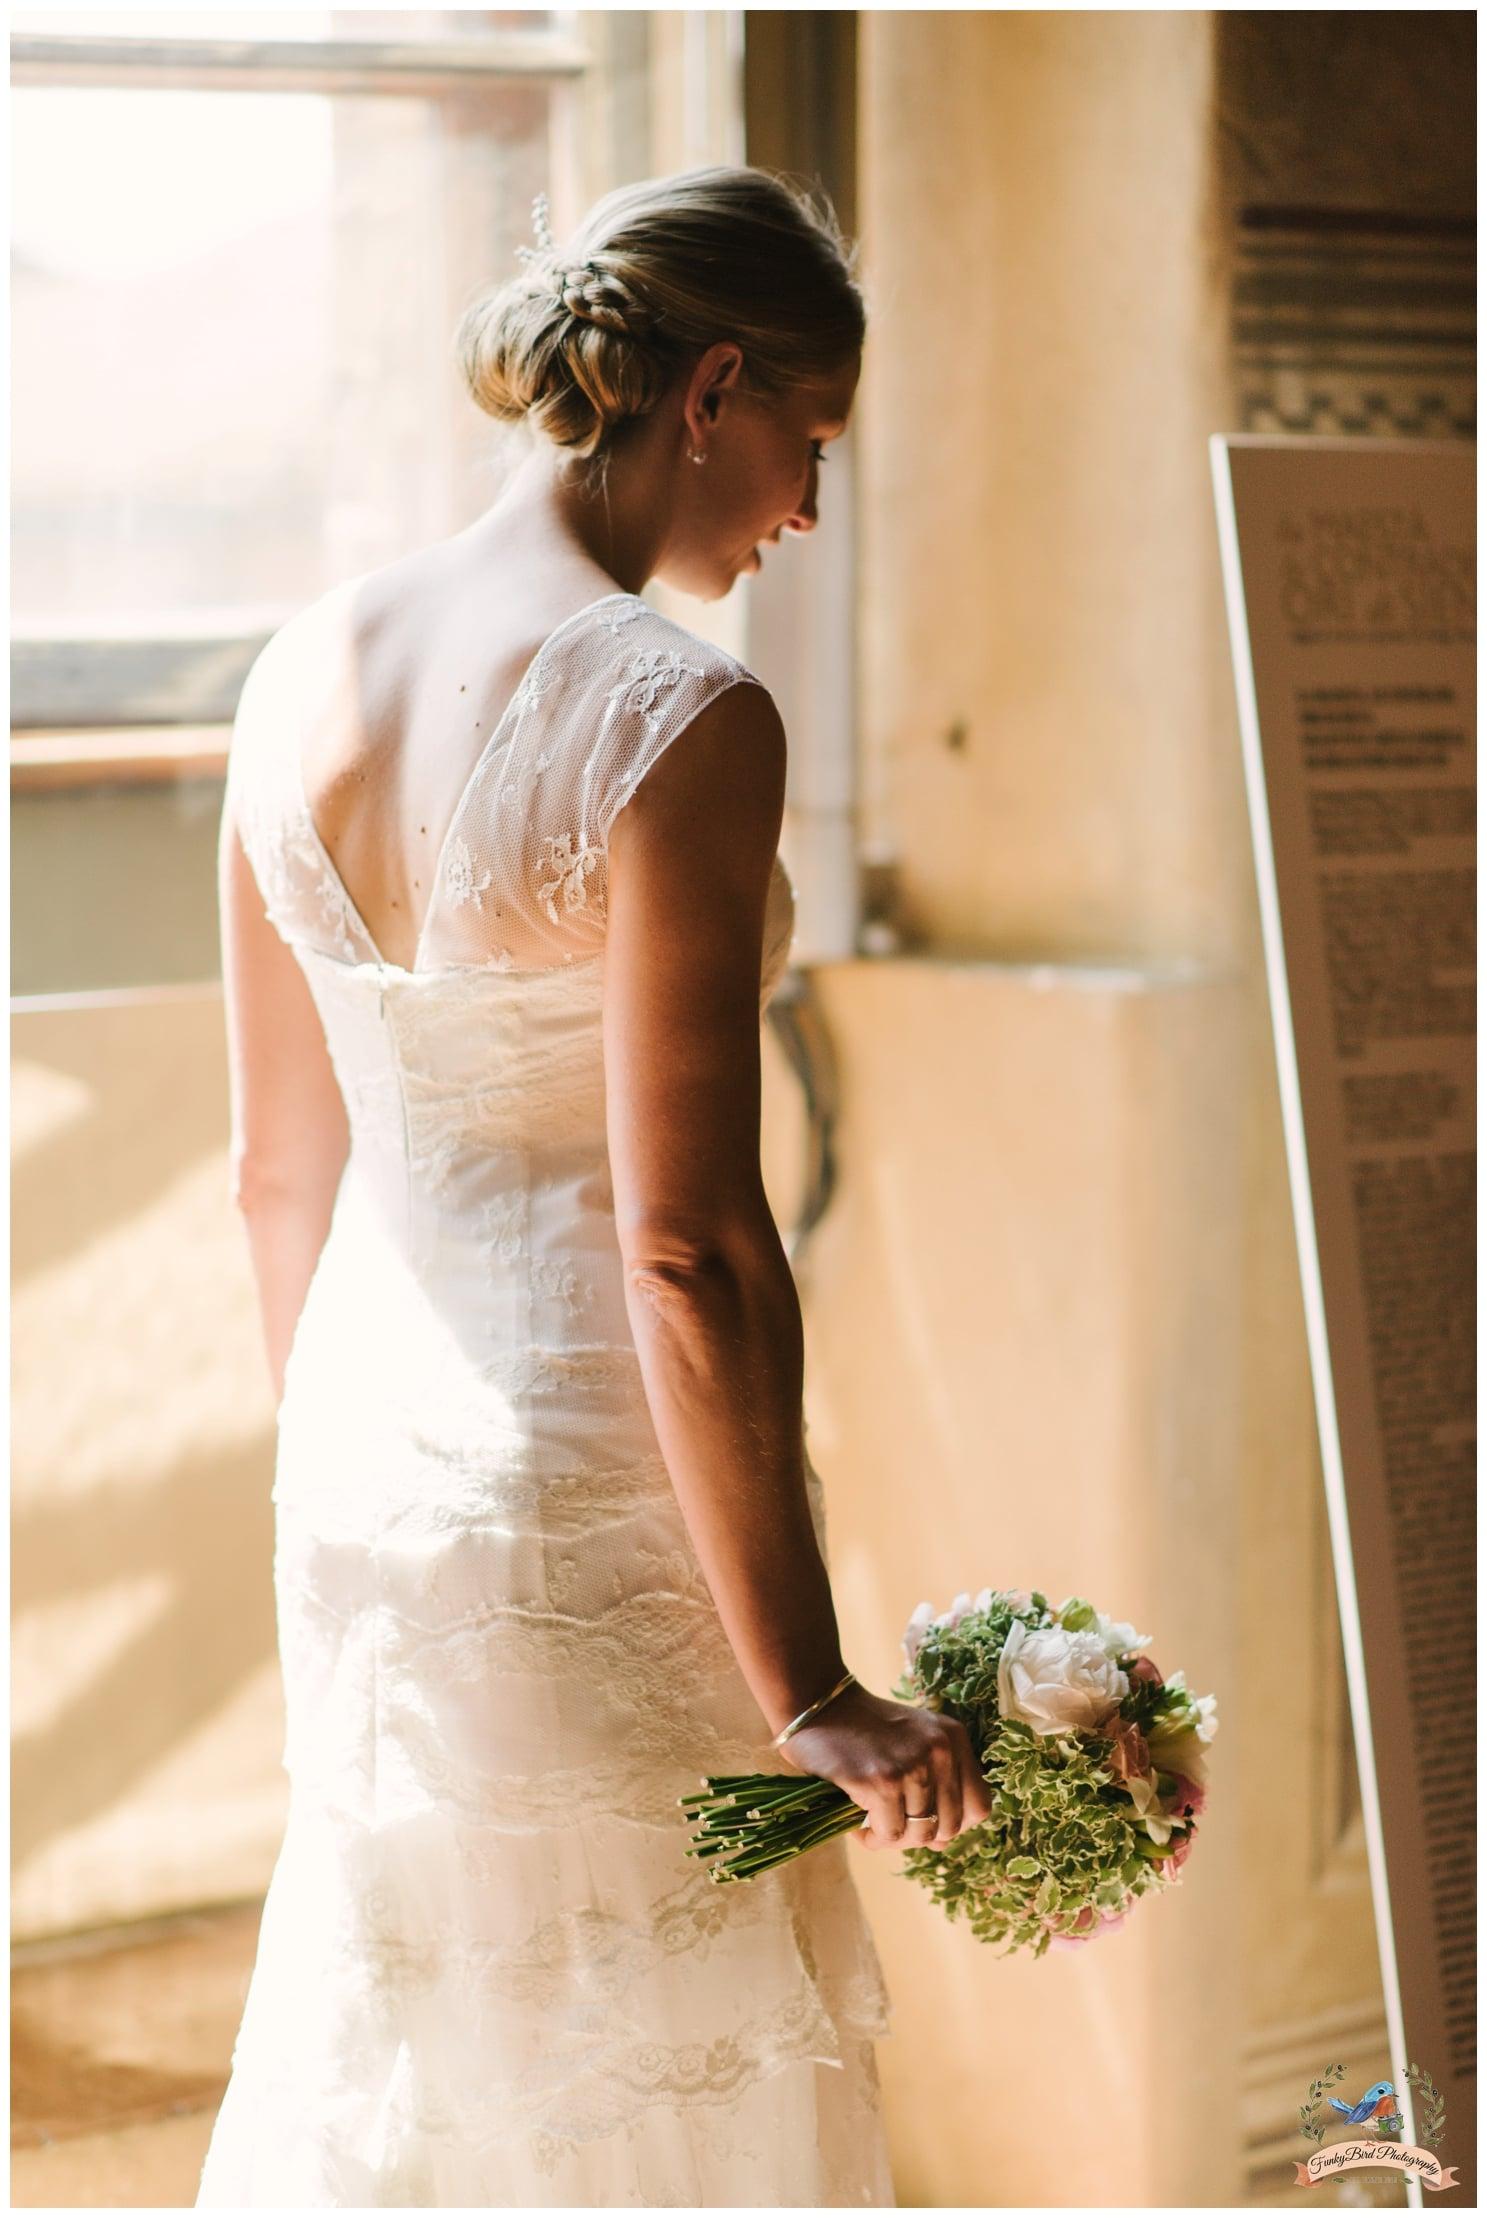 Wedding_Photographer_in_Tuscany_Italy_0008.jpg